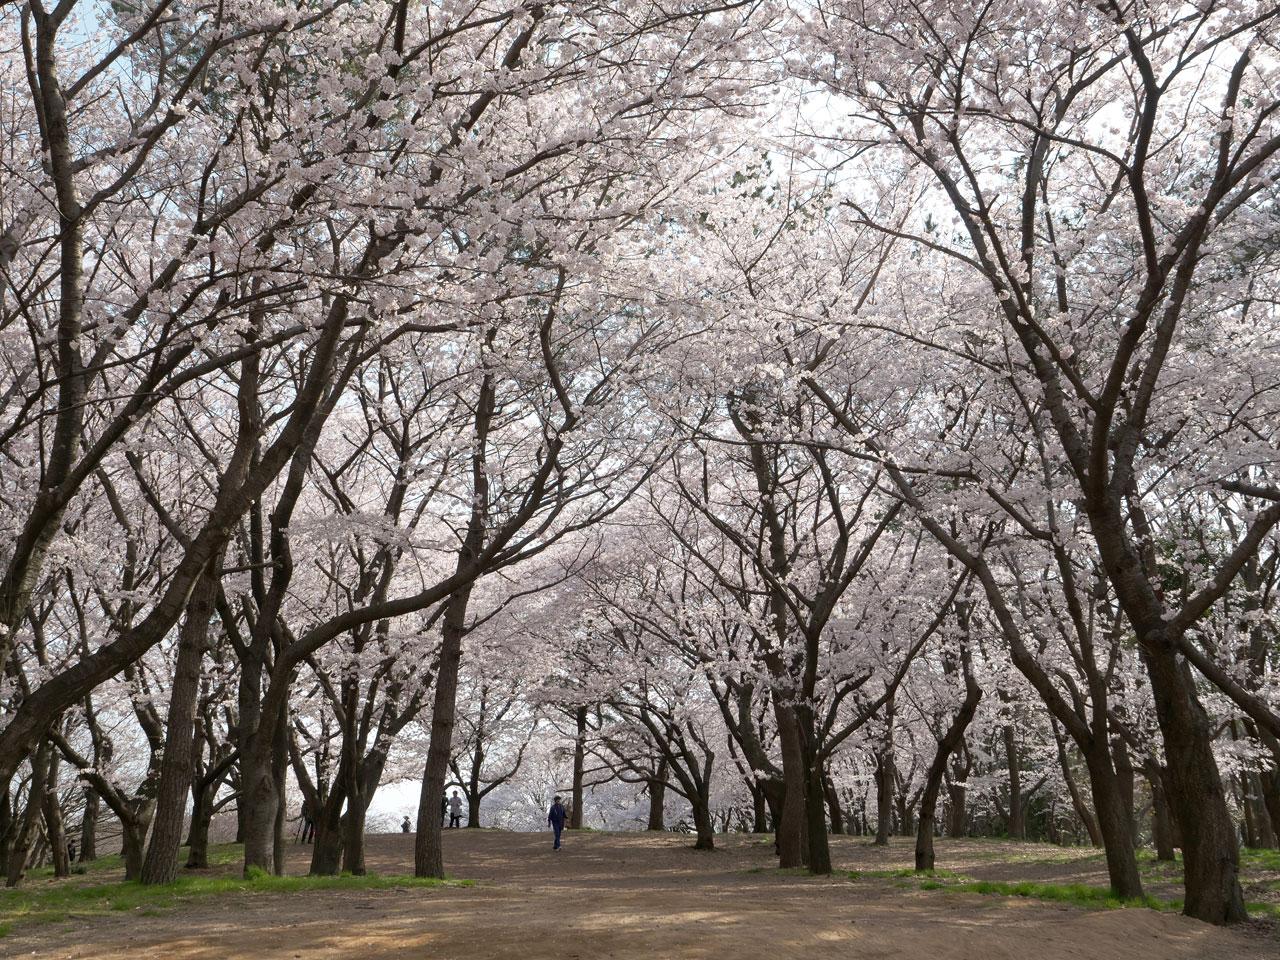 鳥屋野潟公園の桜1:LUMIX DMC-G99+LEICA DG VARIO-ELMARIT 12-60mm/F2.8-4.0